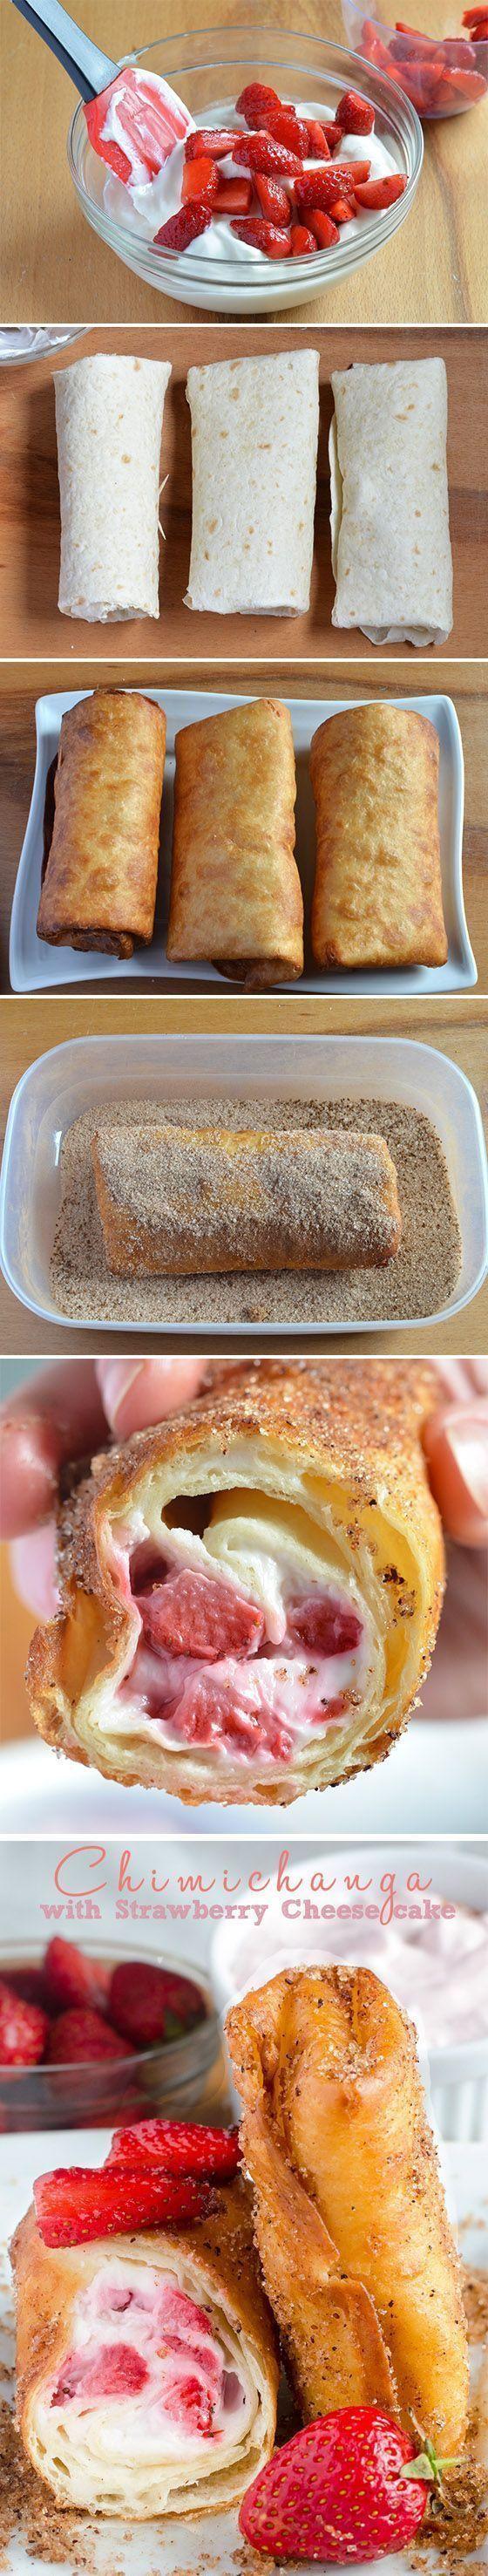 Strawberry Cheesecake Chimichangas breakfast recipe recipes desert recipes cheesecake kids recipes food tutorials breafast recipes